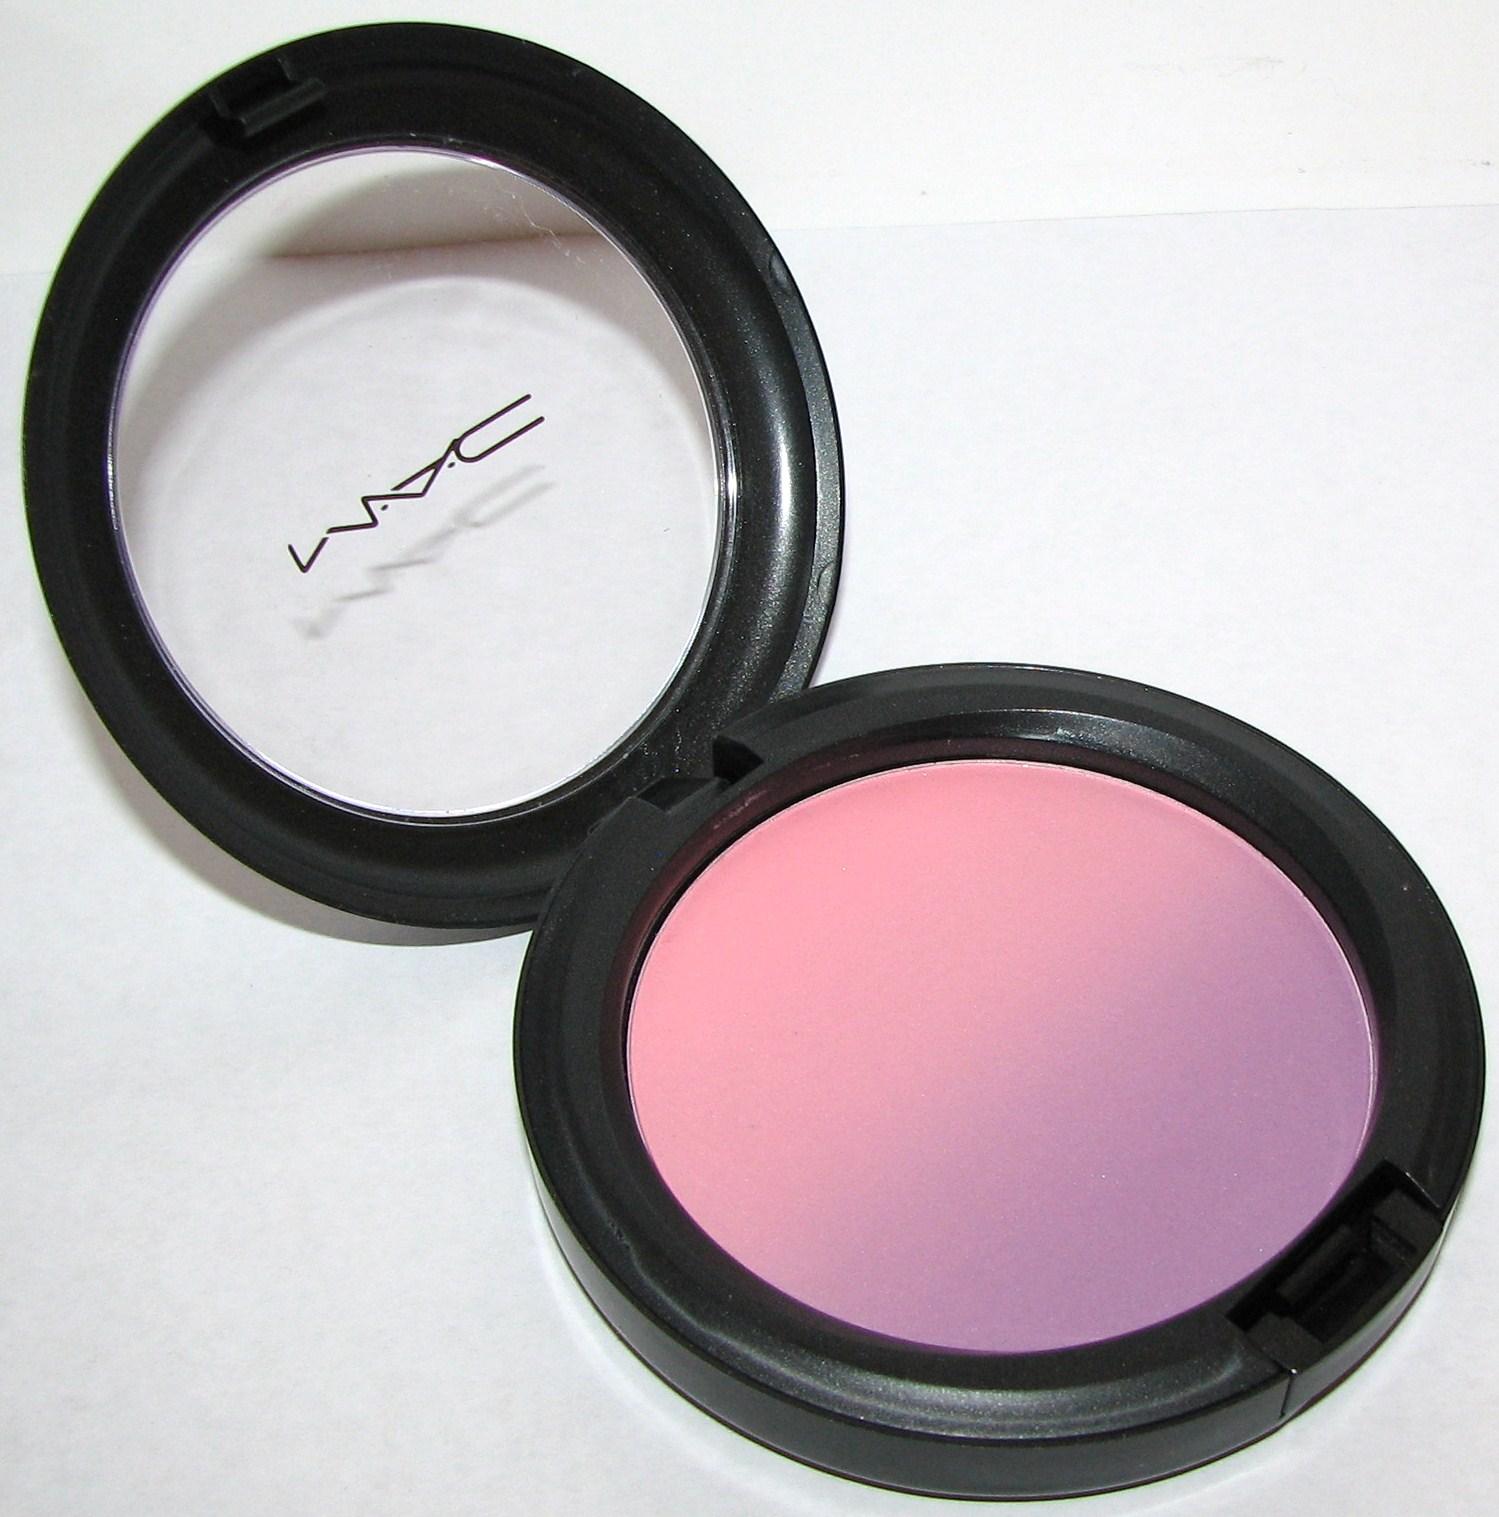 mac azalea blossom blush - photo #16